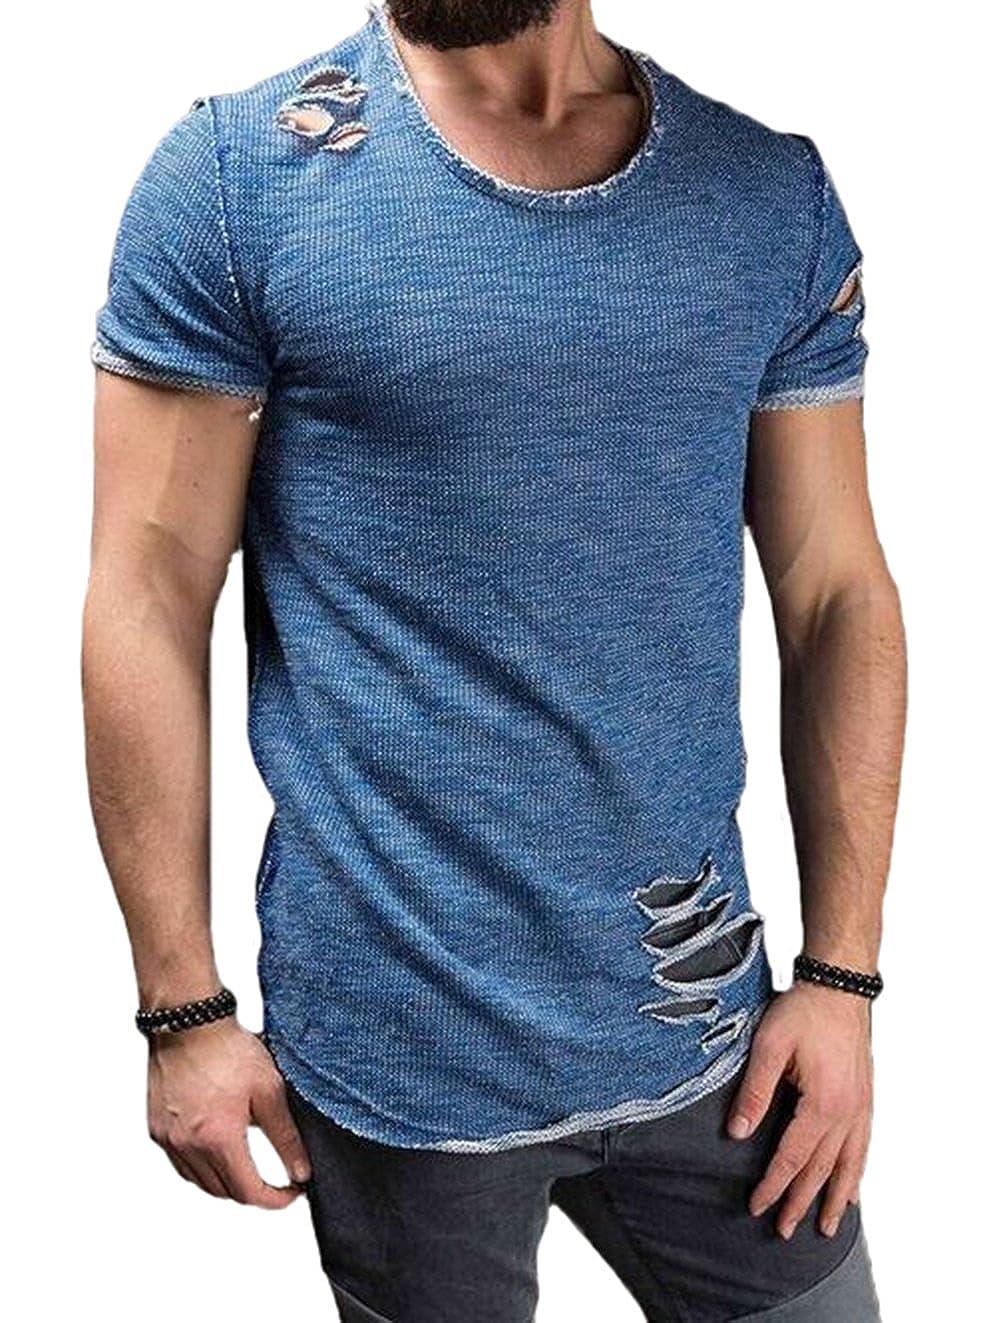 0373fe91269 Top 10 wholesale Slim Fit Longline T Shirt - Chinabrands.com